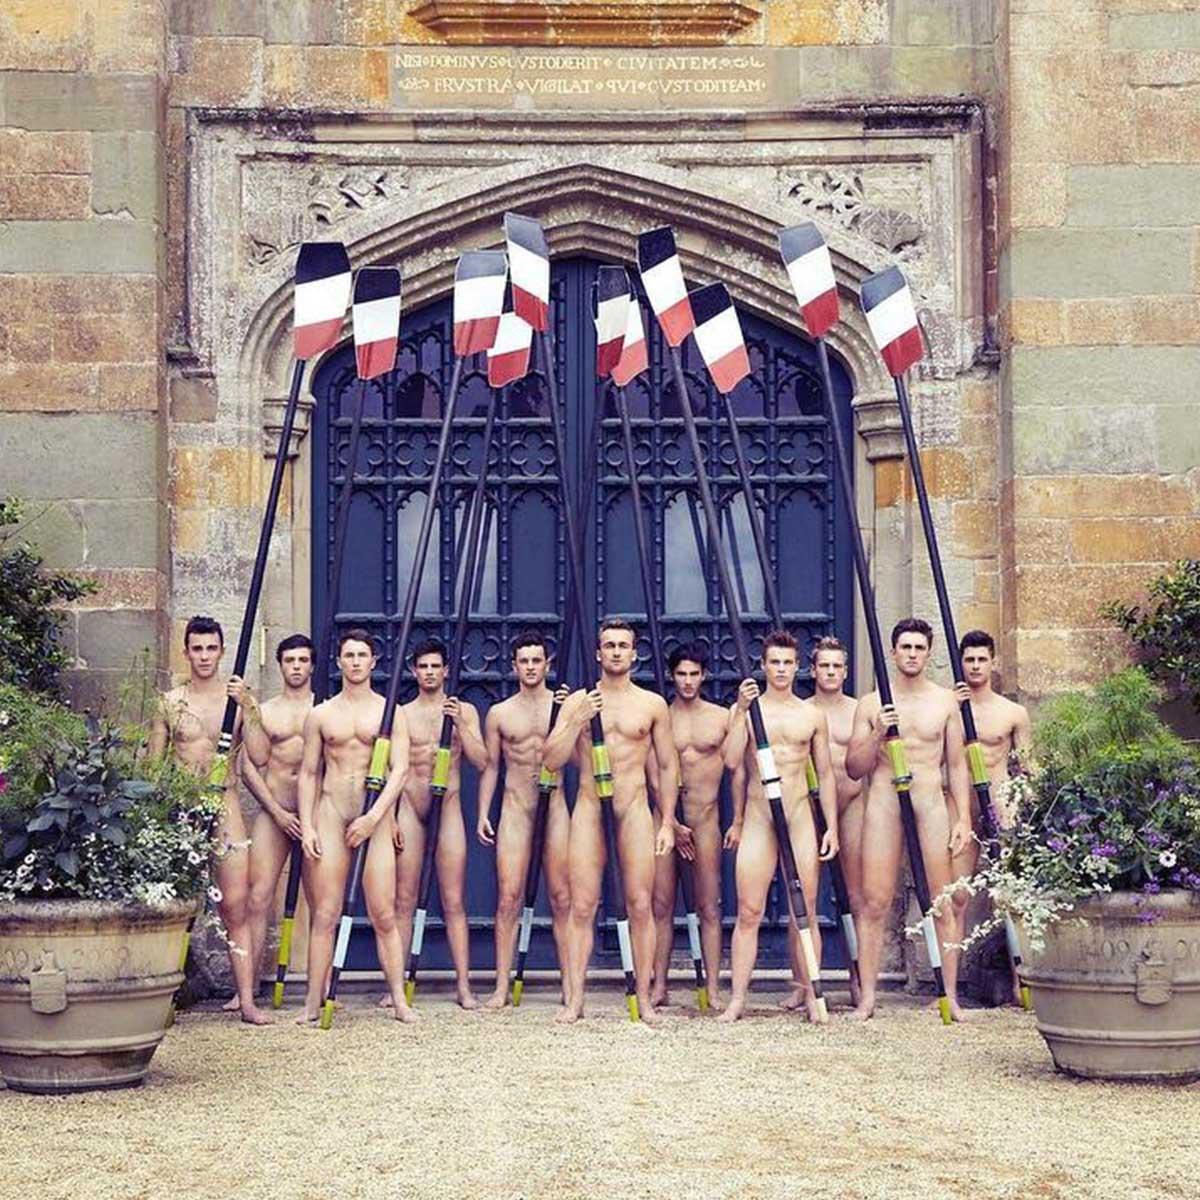 Warwick Rowers Nude Gallery My Hotz Pic